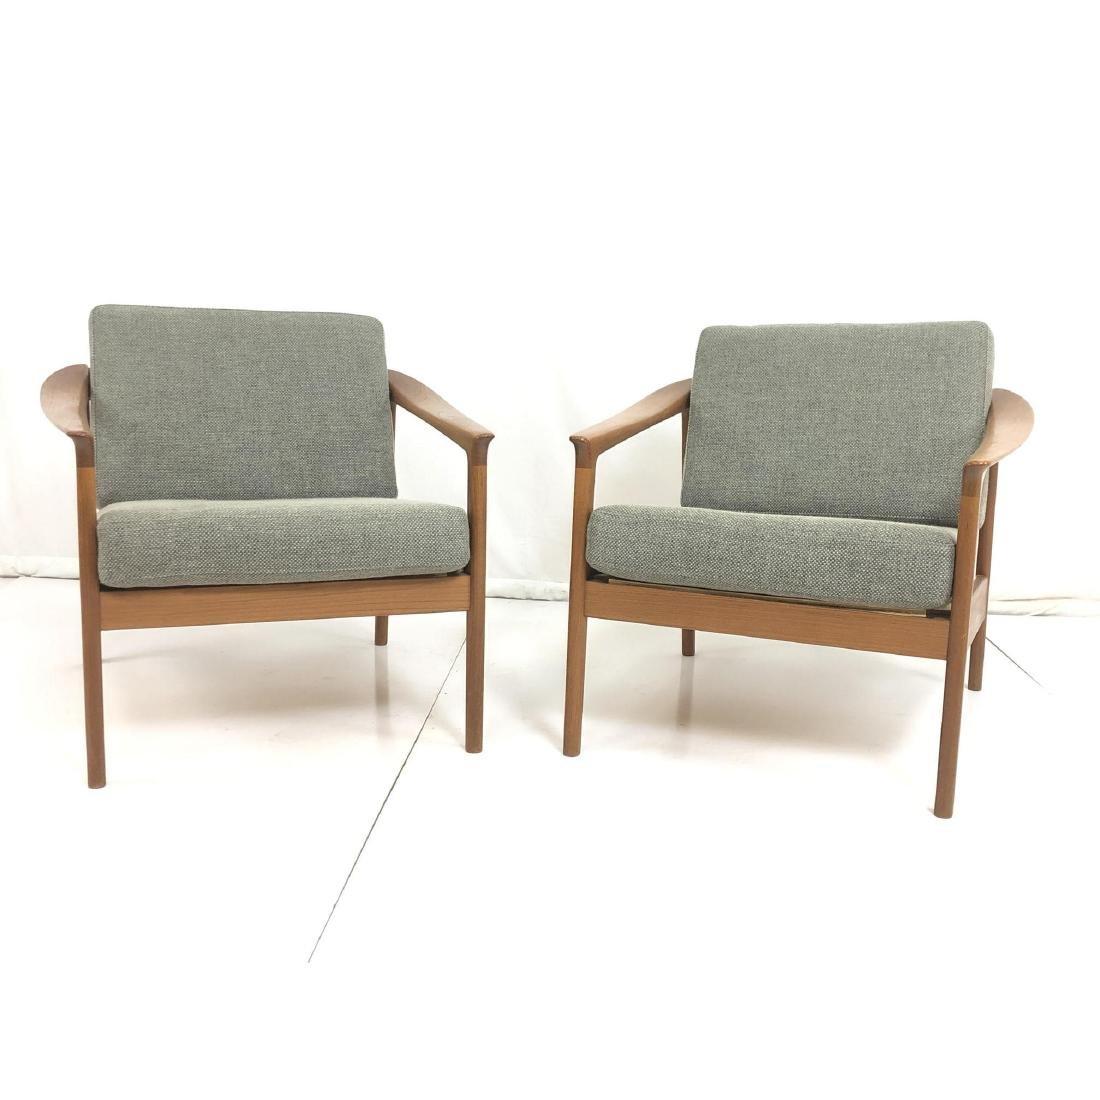 Pr FOLKE OHLSSON Danish Modern Teak Lounge Chairs - 4